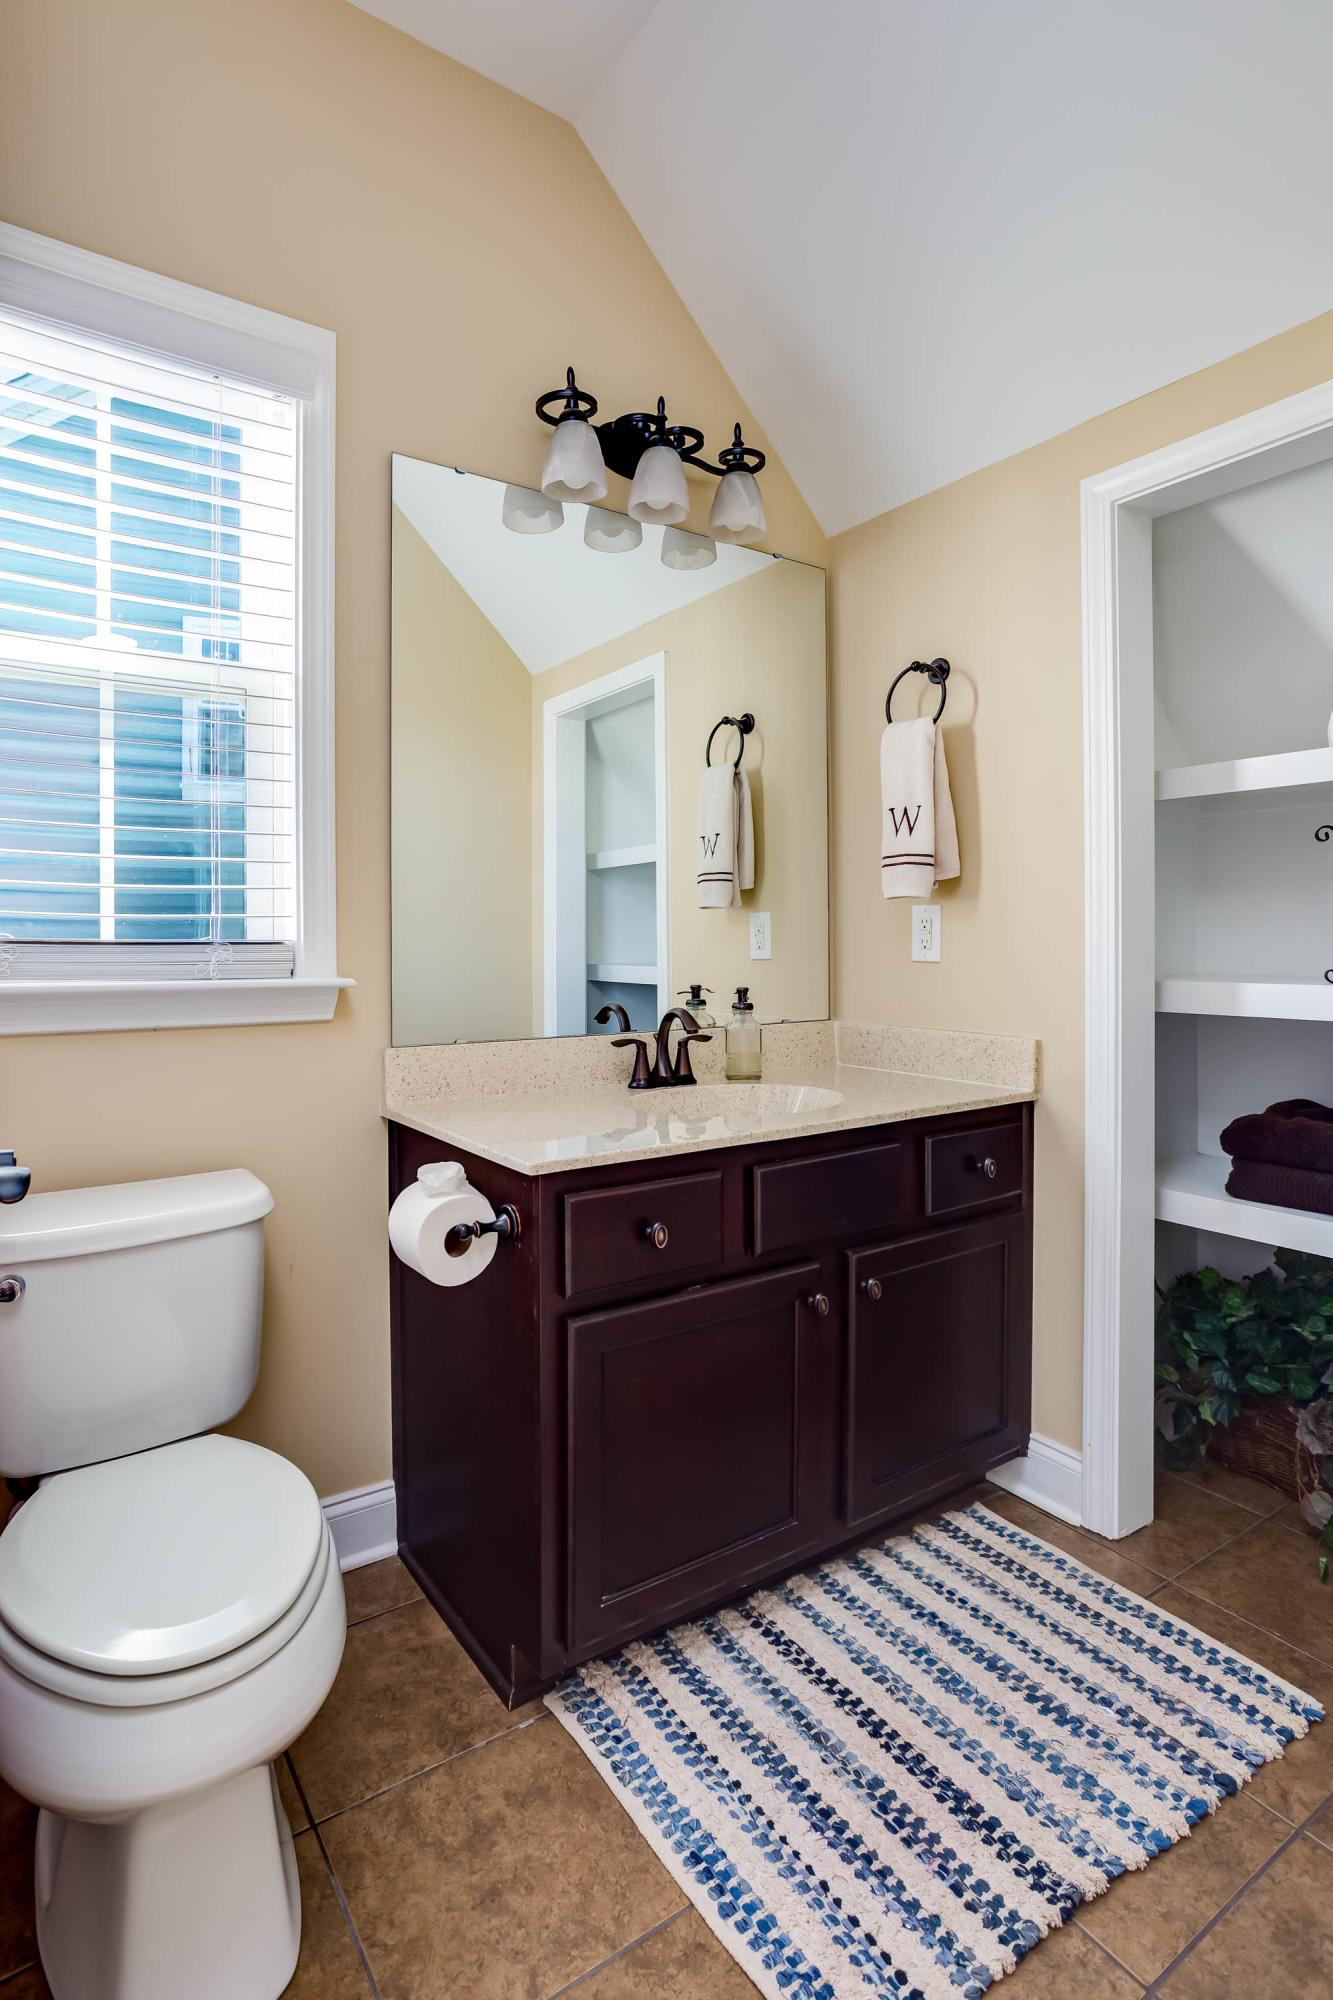 Dunes West Homes For Sale - 3216 Hatchway, Mount Pleasant, SC - 0